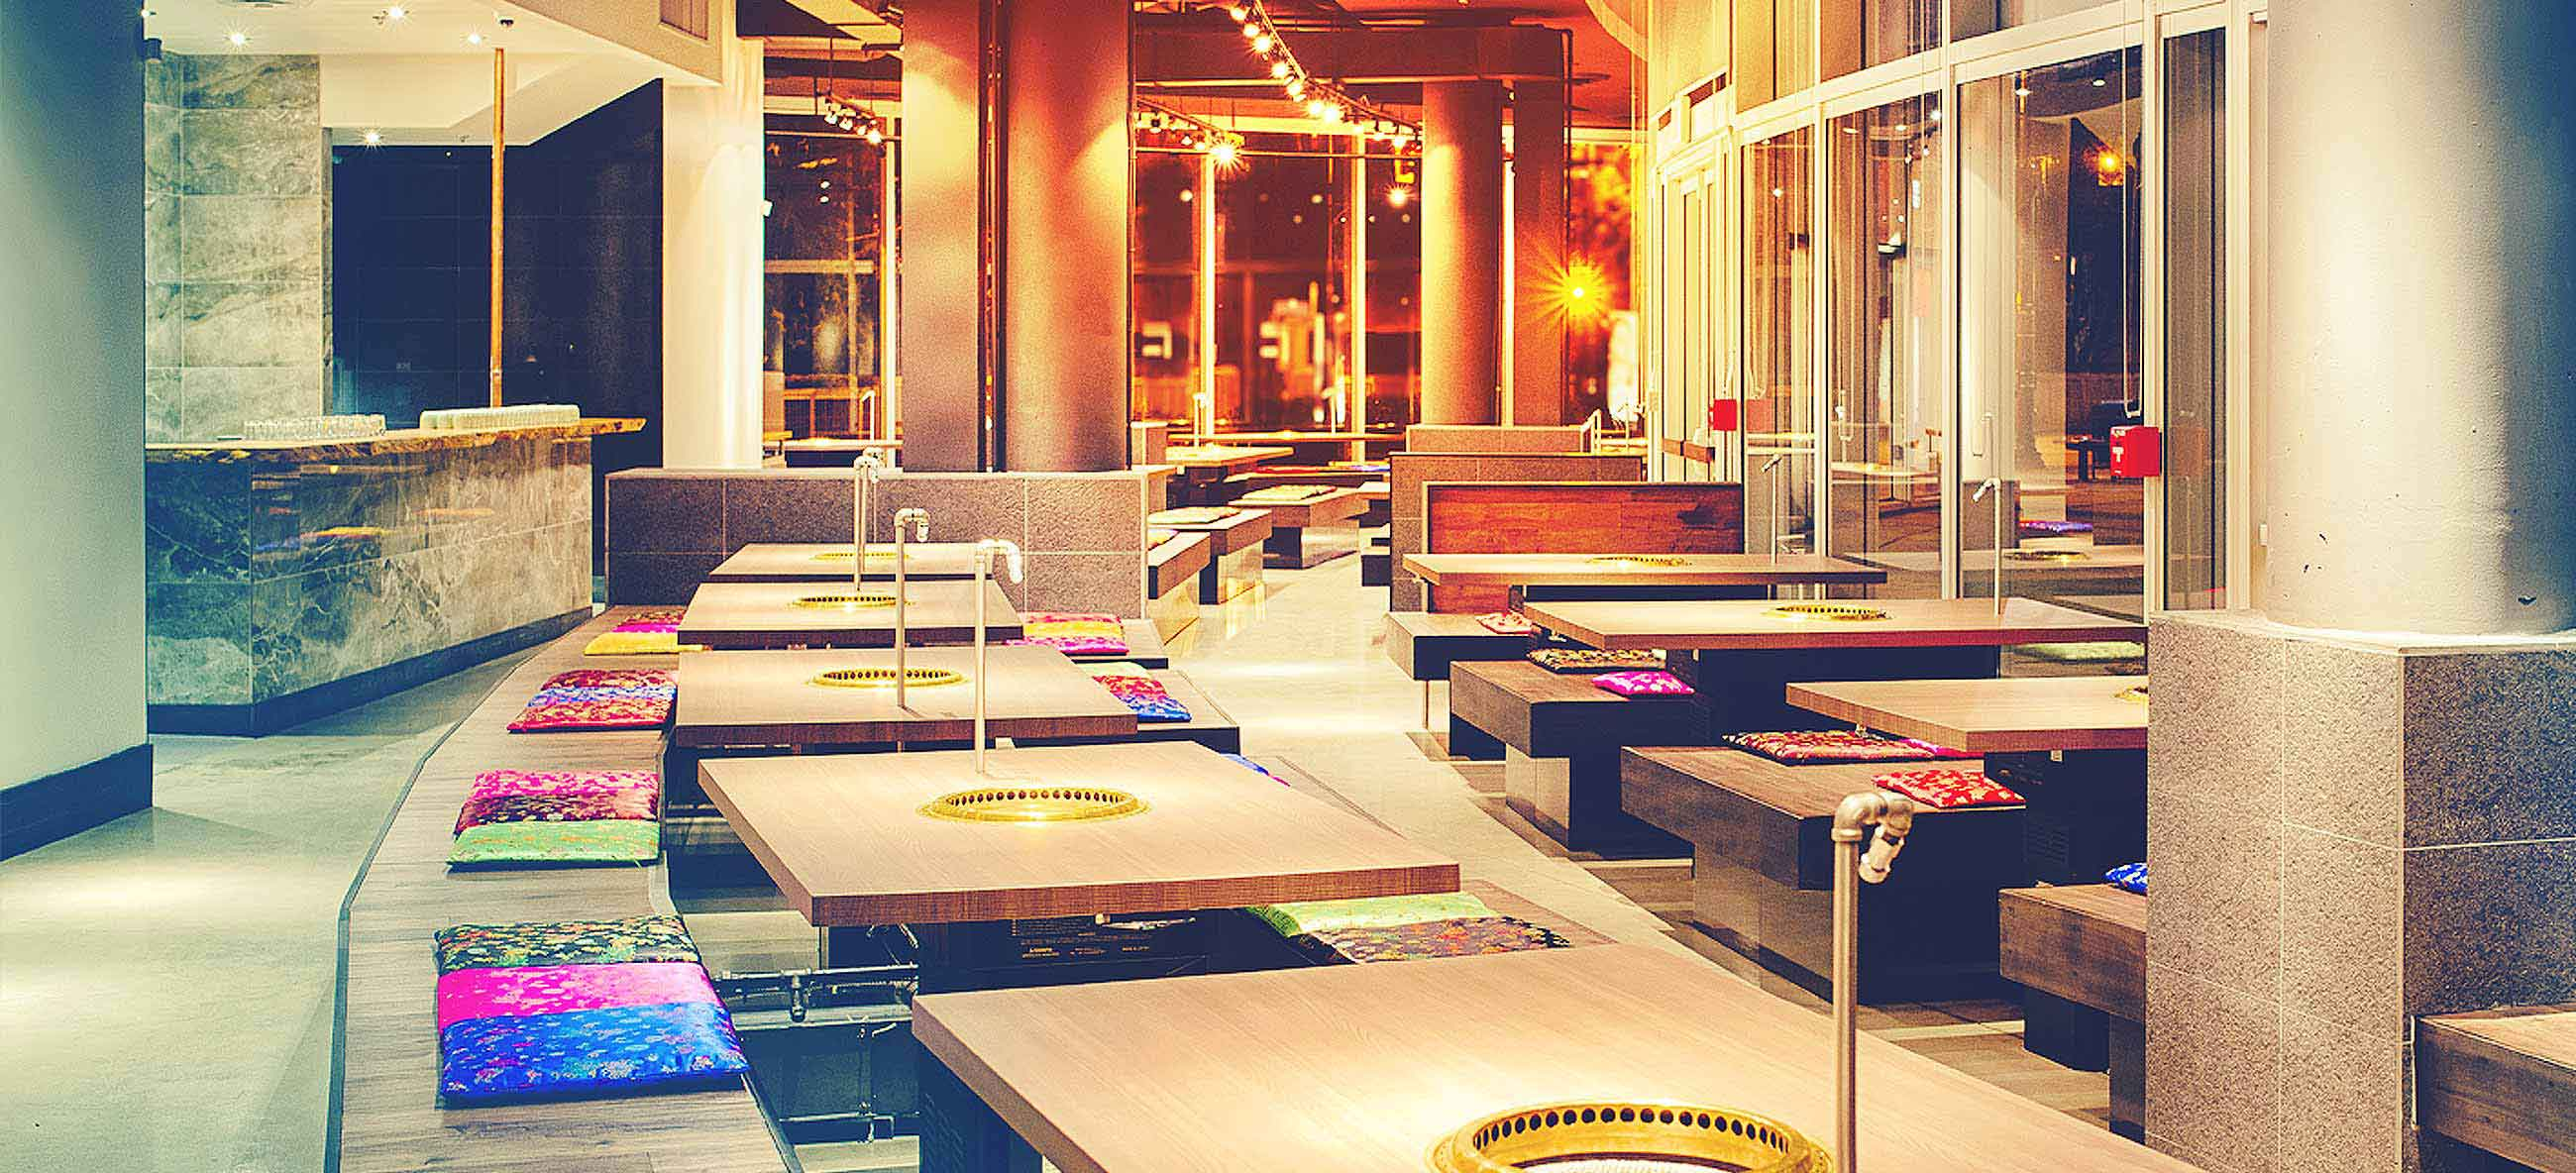 sura korean bbq restaurant showcase richmond bc canada. Black Bedroom Furniture Sets. Home Design Ideas